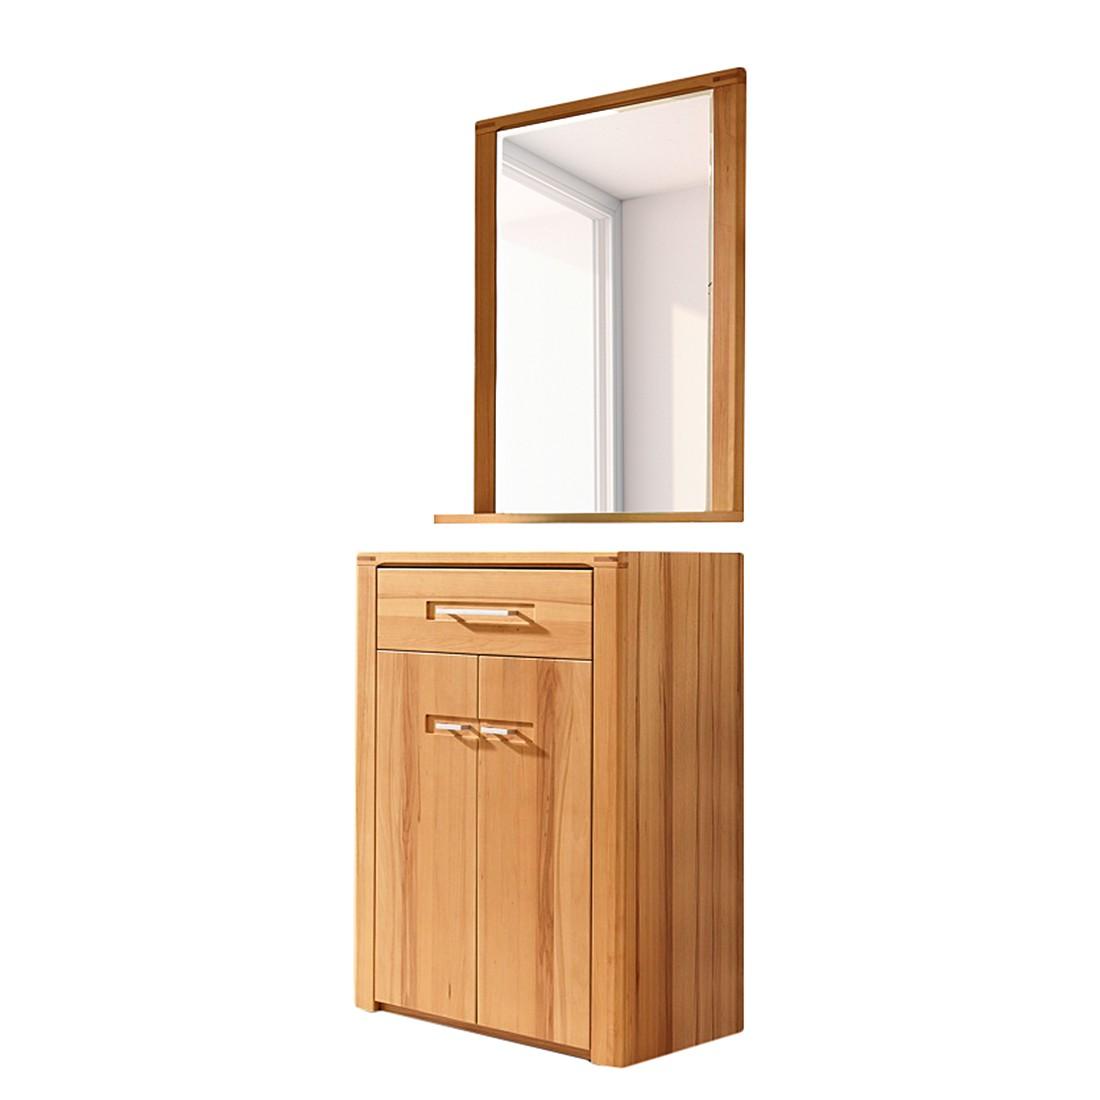 garderobenset naturestar 2 teilig kernbuche teilmassiv. Black Bedroom Furniture Sets. Home Design Ideas